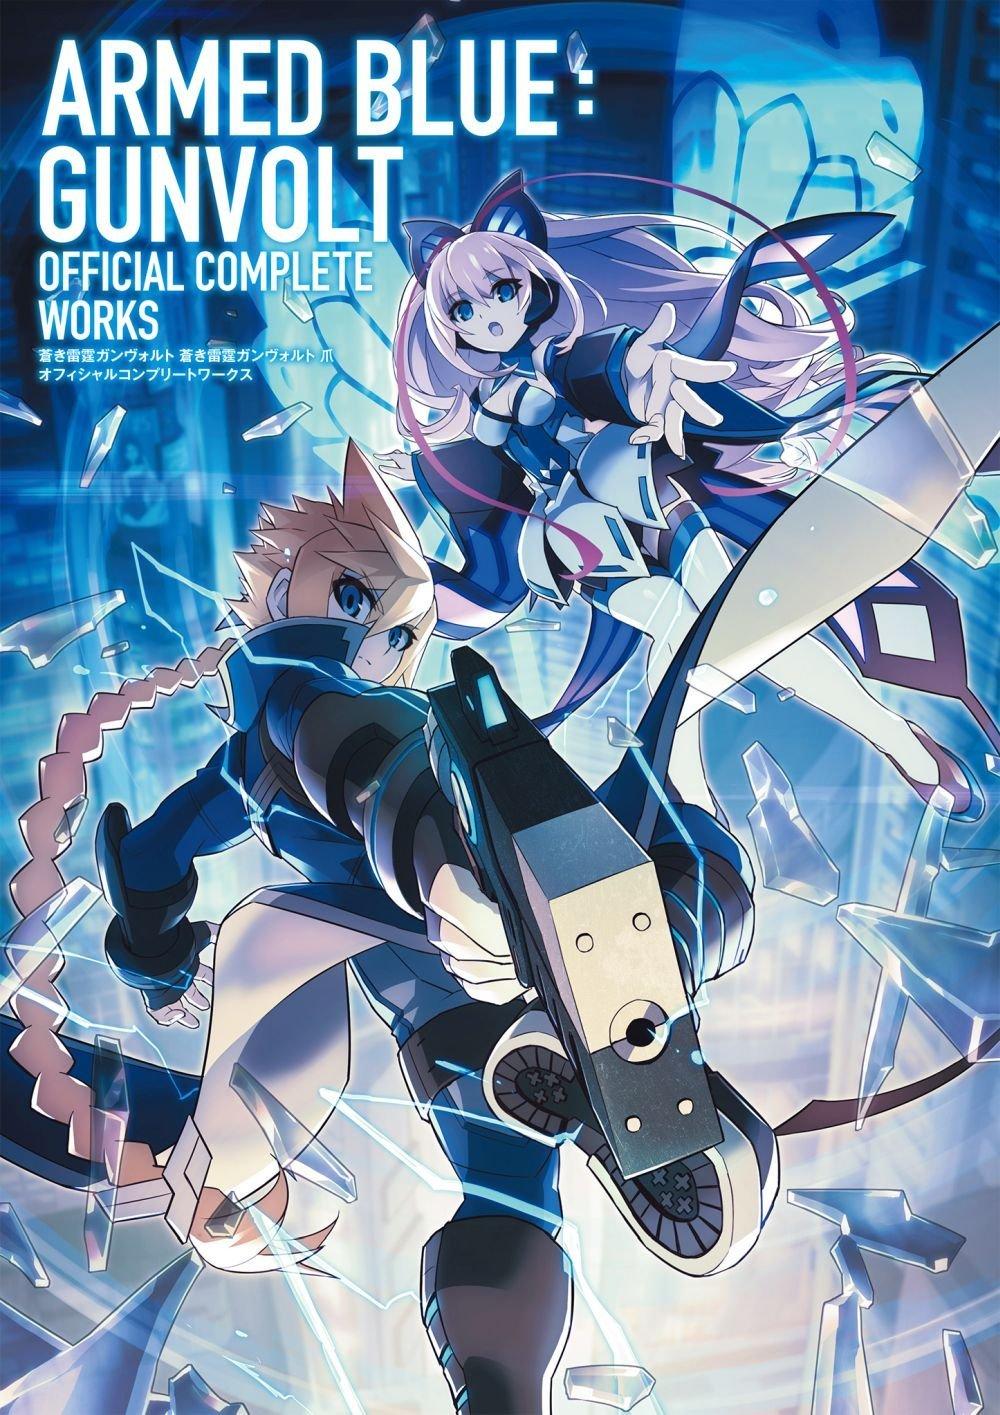 Armed Blue: Gunvolt (Azure Striker Gunvolt) Official Complete Works